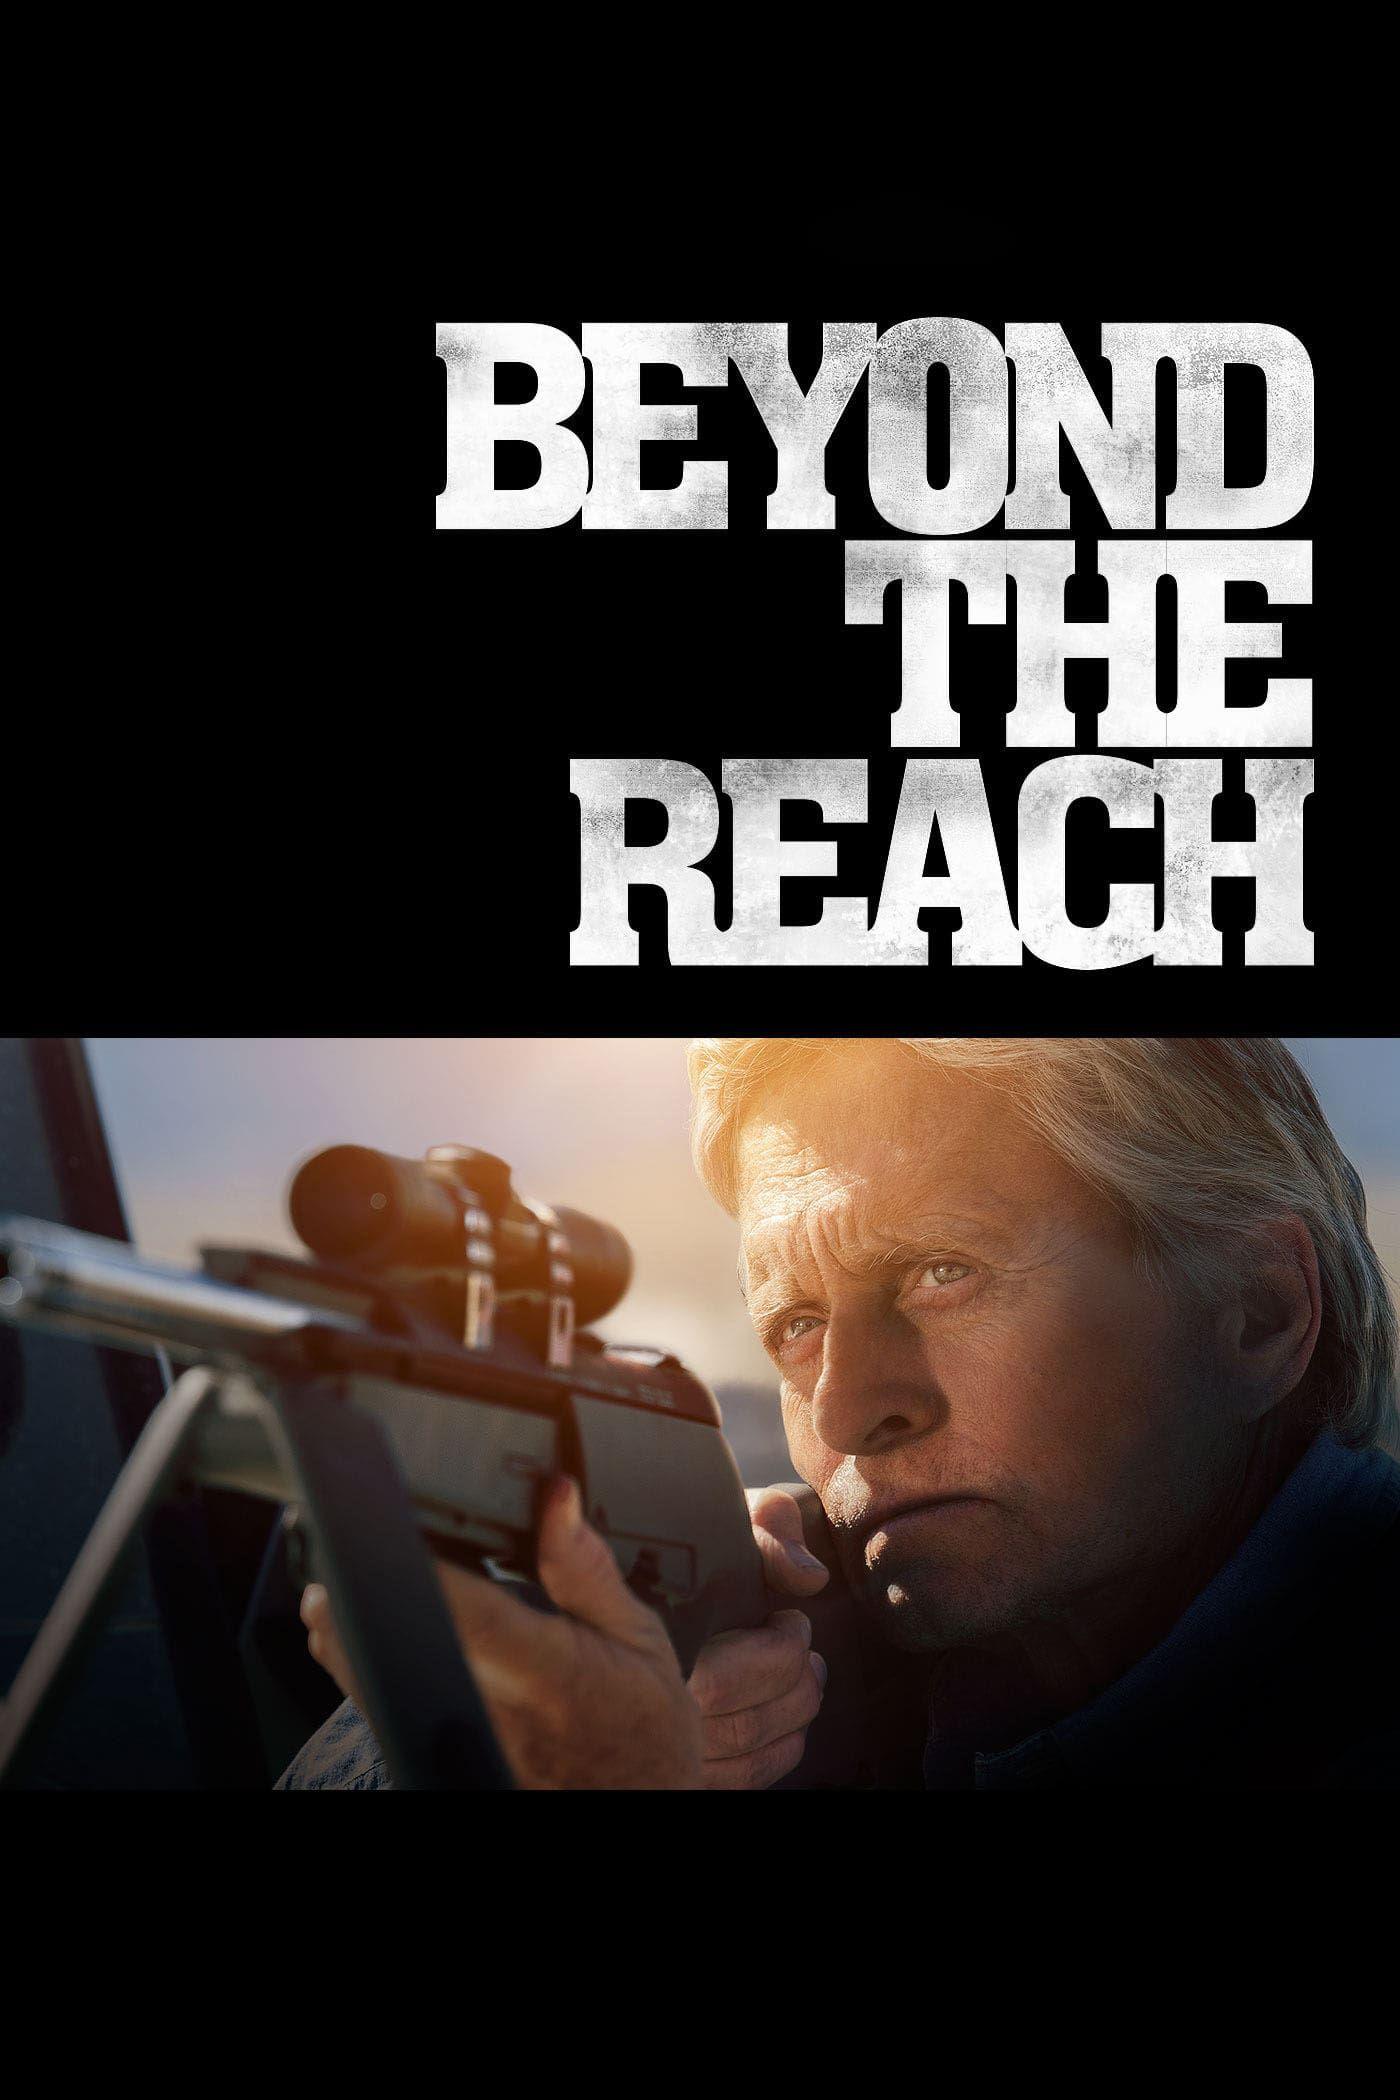 Watch Beyond The Reach Full Hd Movie Online Hd Movies Tv Series